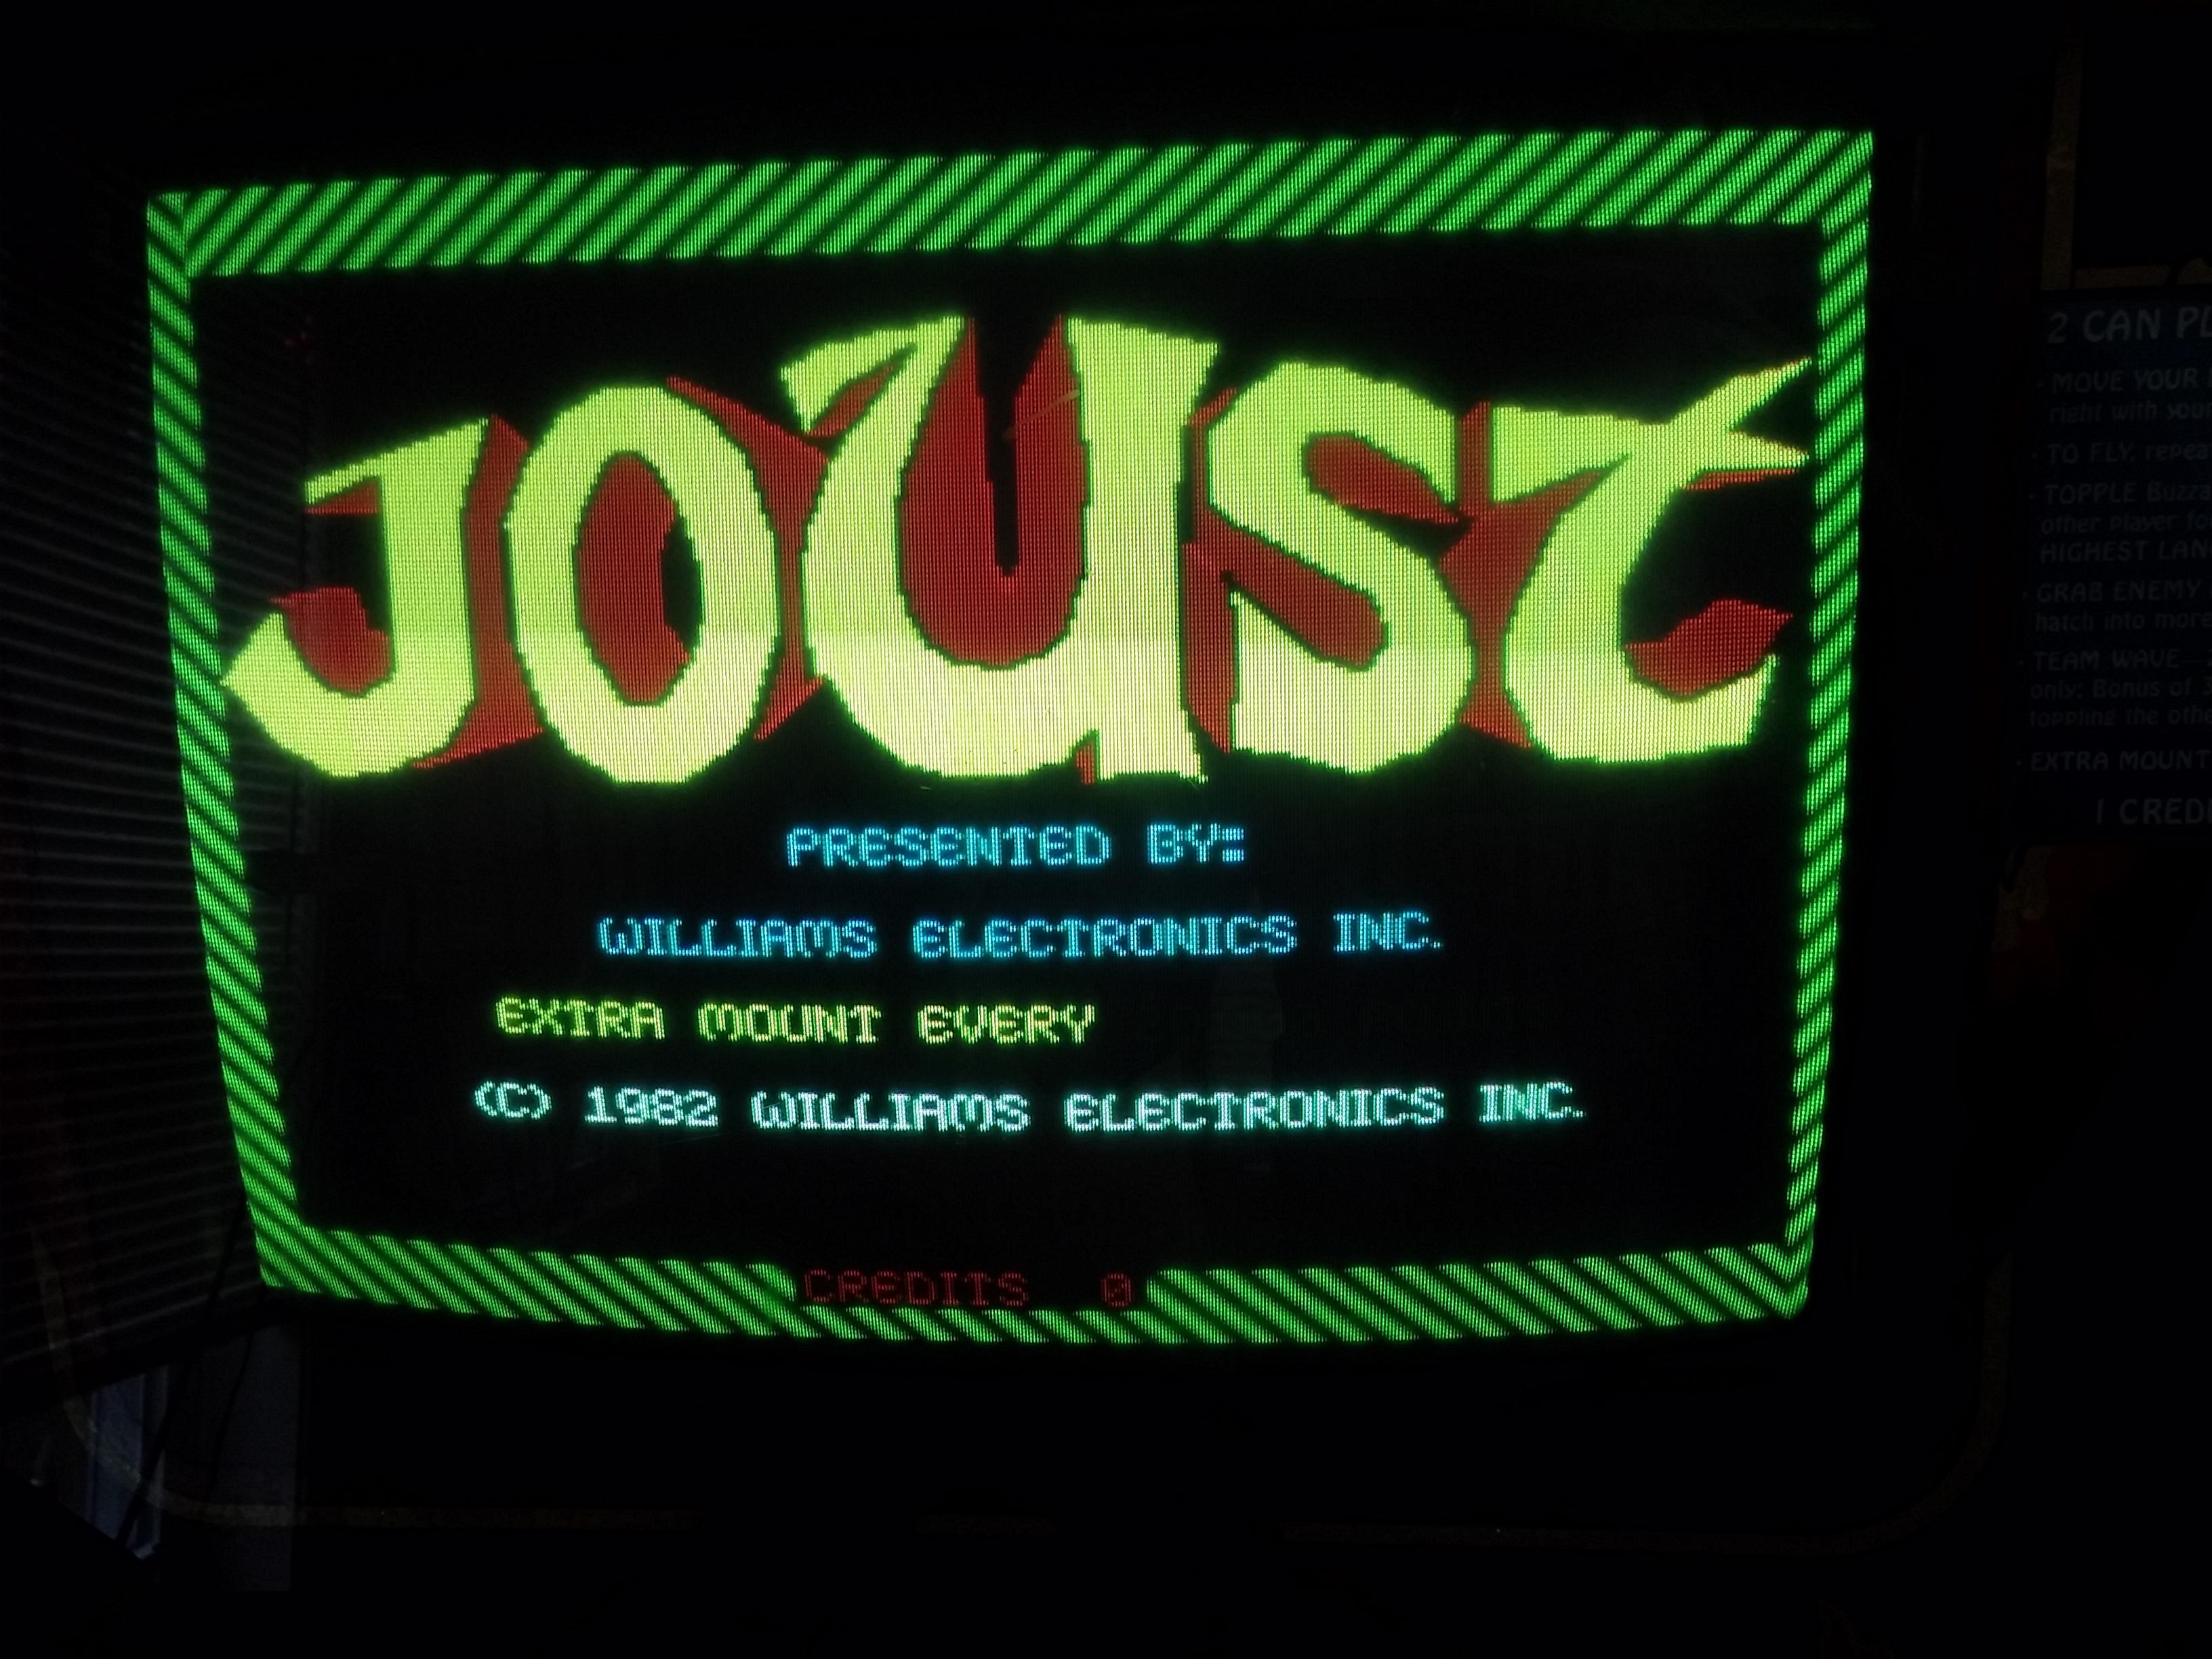 Bringing Joust Back to Life